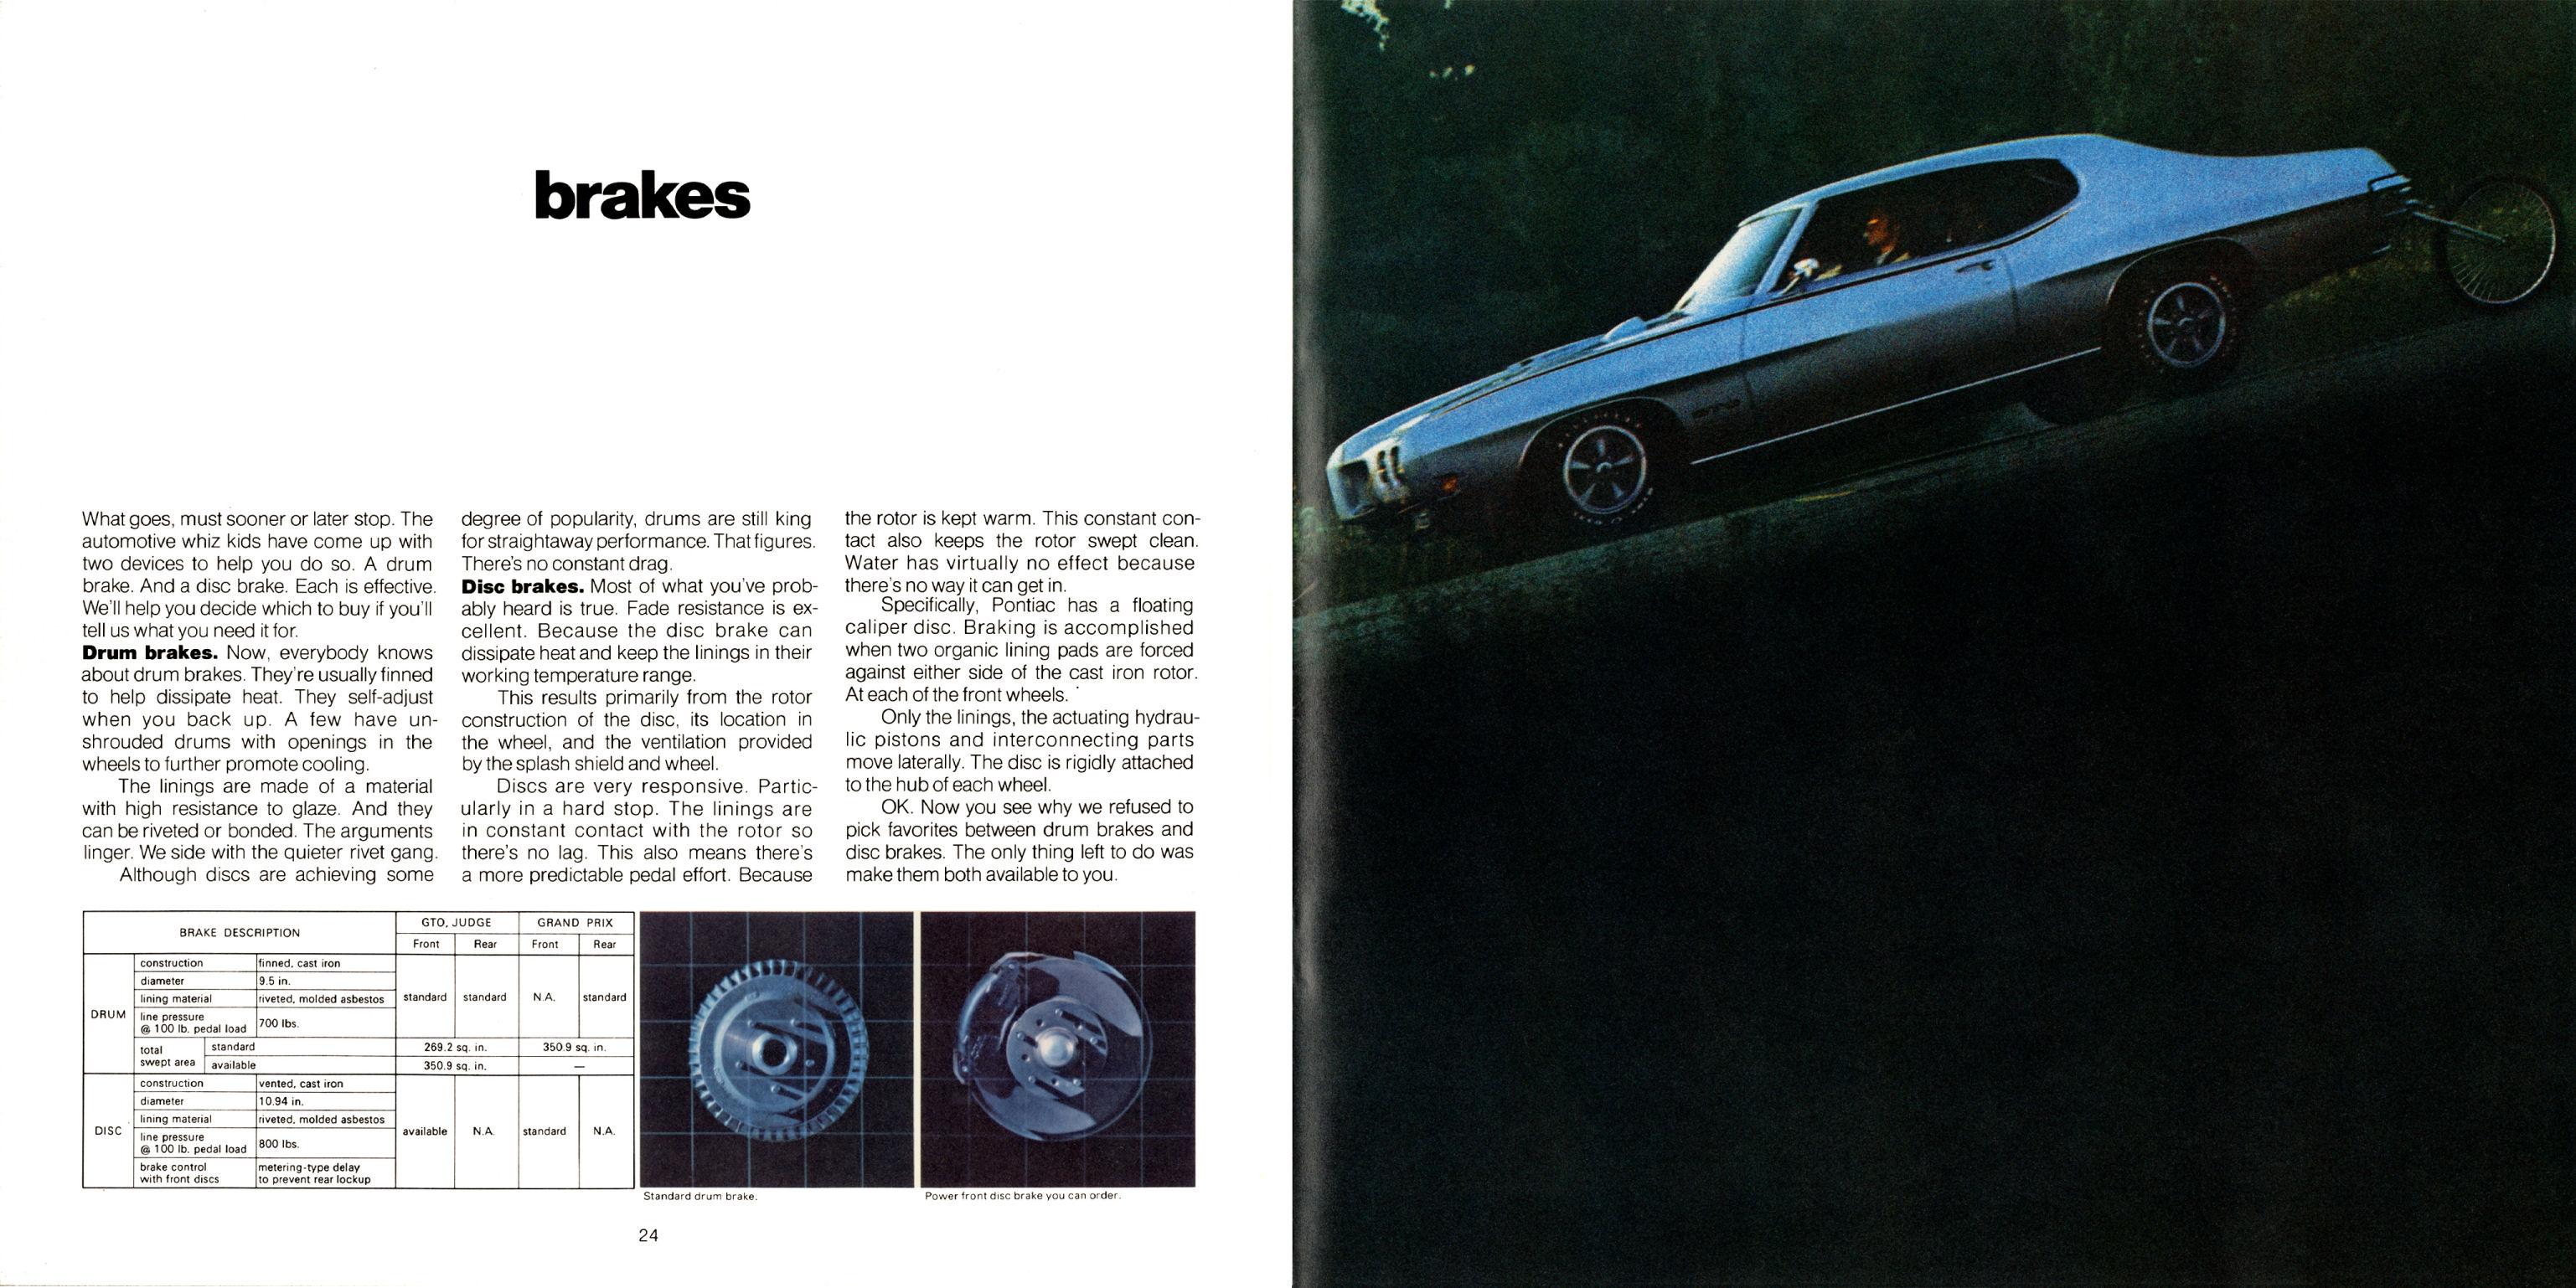 1970%20Pontiac%20Performance-24-25.jpg